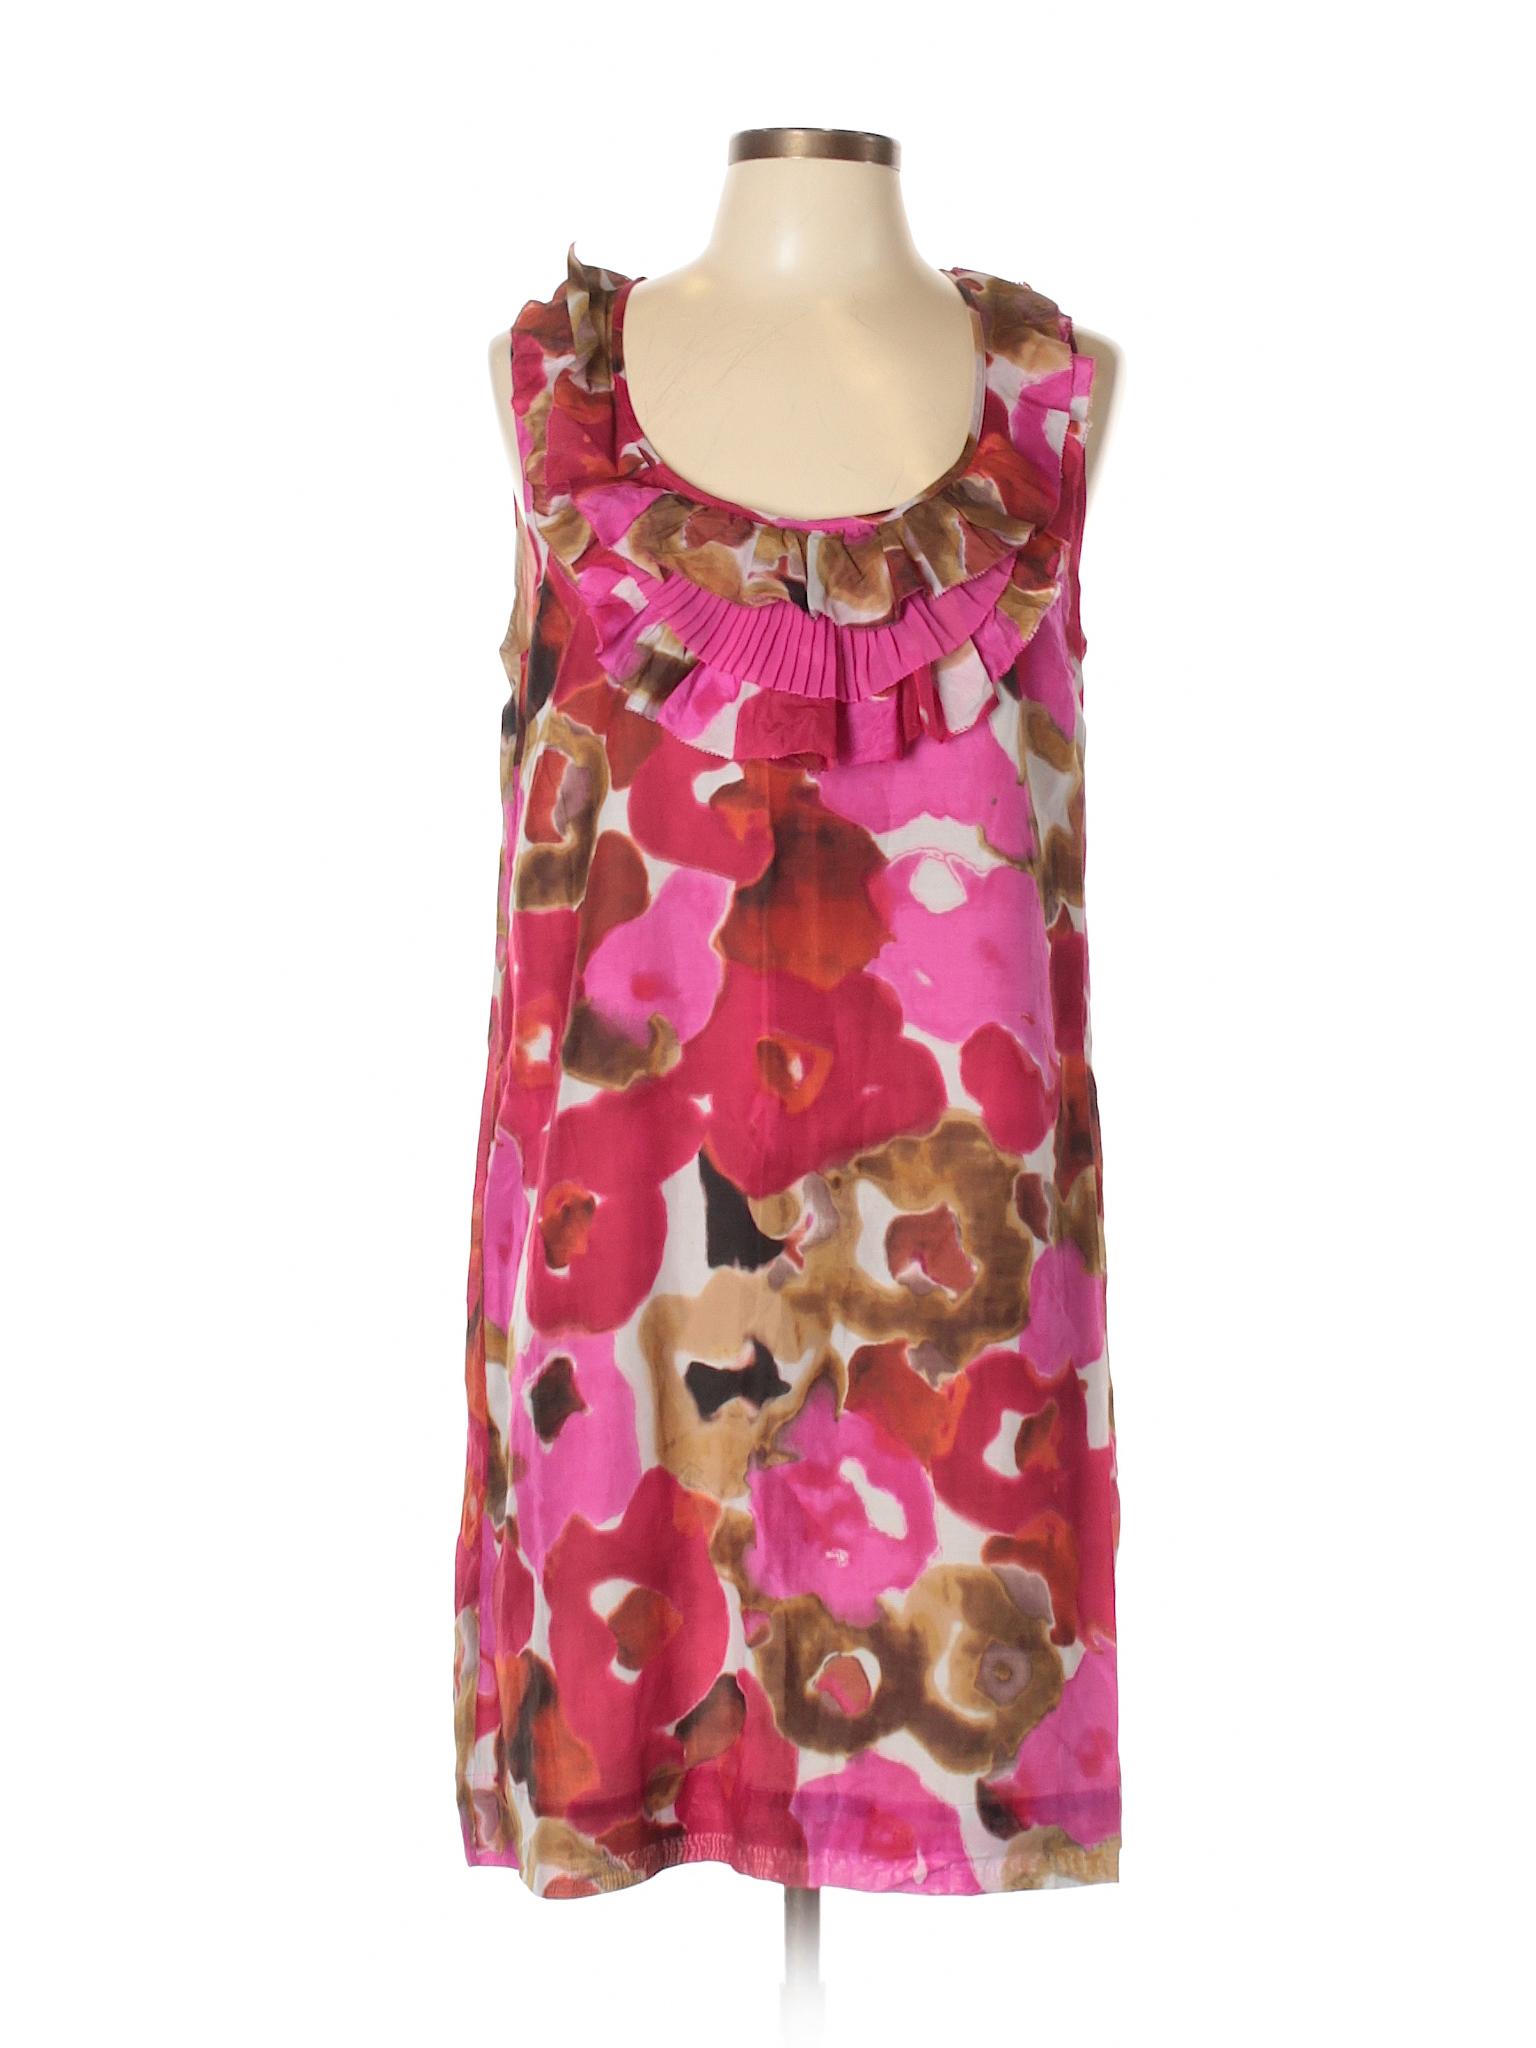 Dress Casual Ann Selling Taylor LOFT 0nwZS44Yq